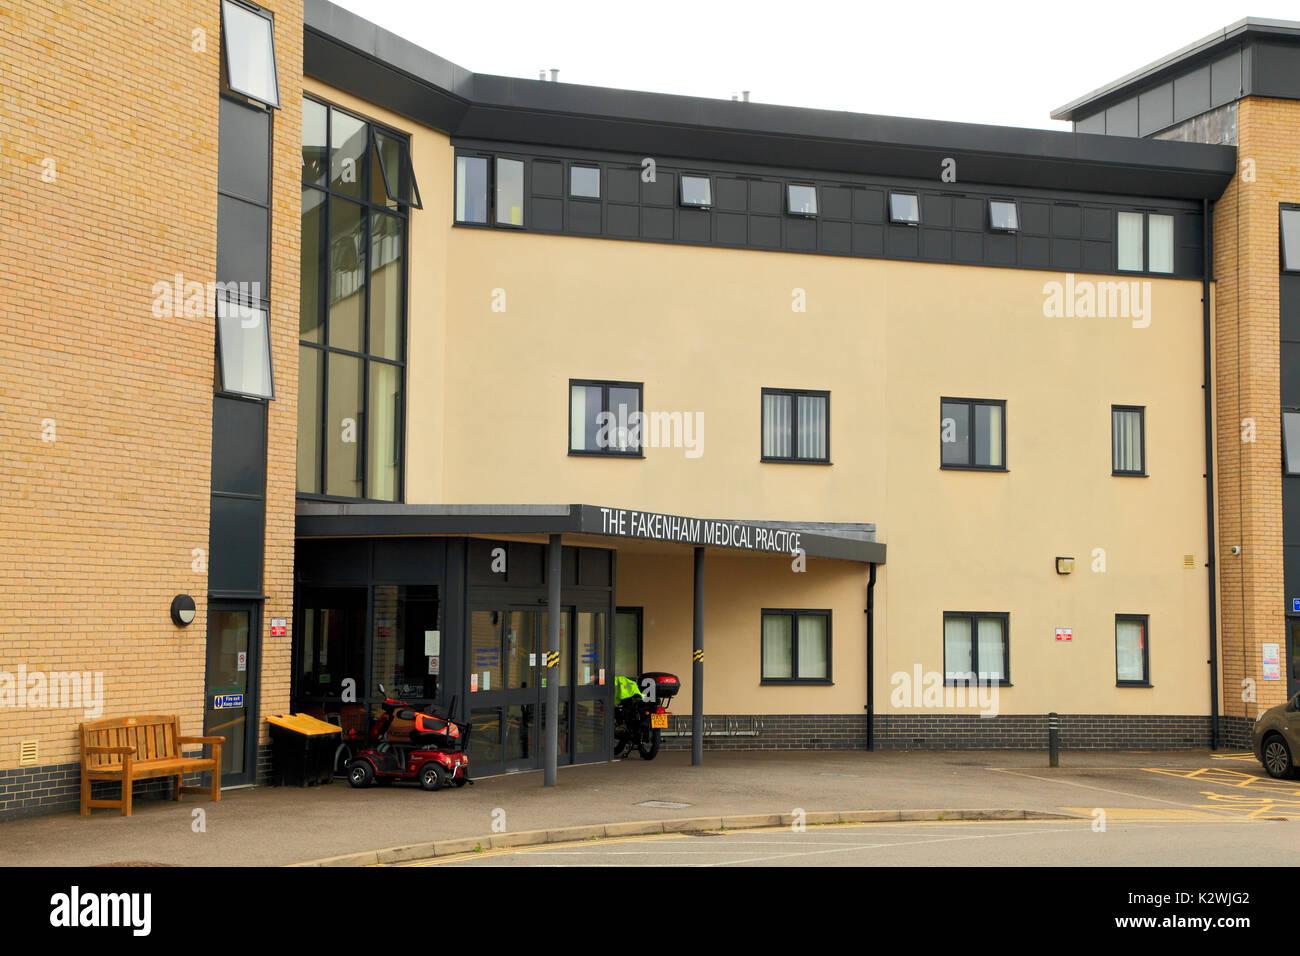 Fakenham Medical Practice, Doctor Surgery, Doctors, Fakenham, Norfolk, England, UK - Stock Image